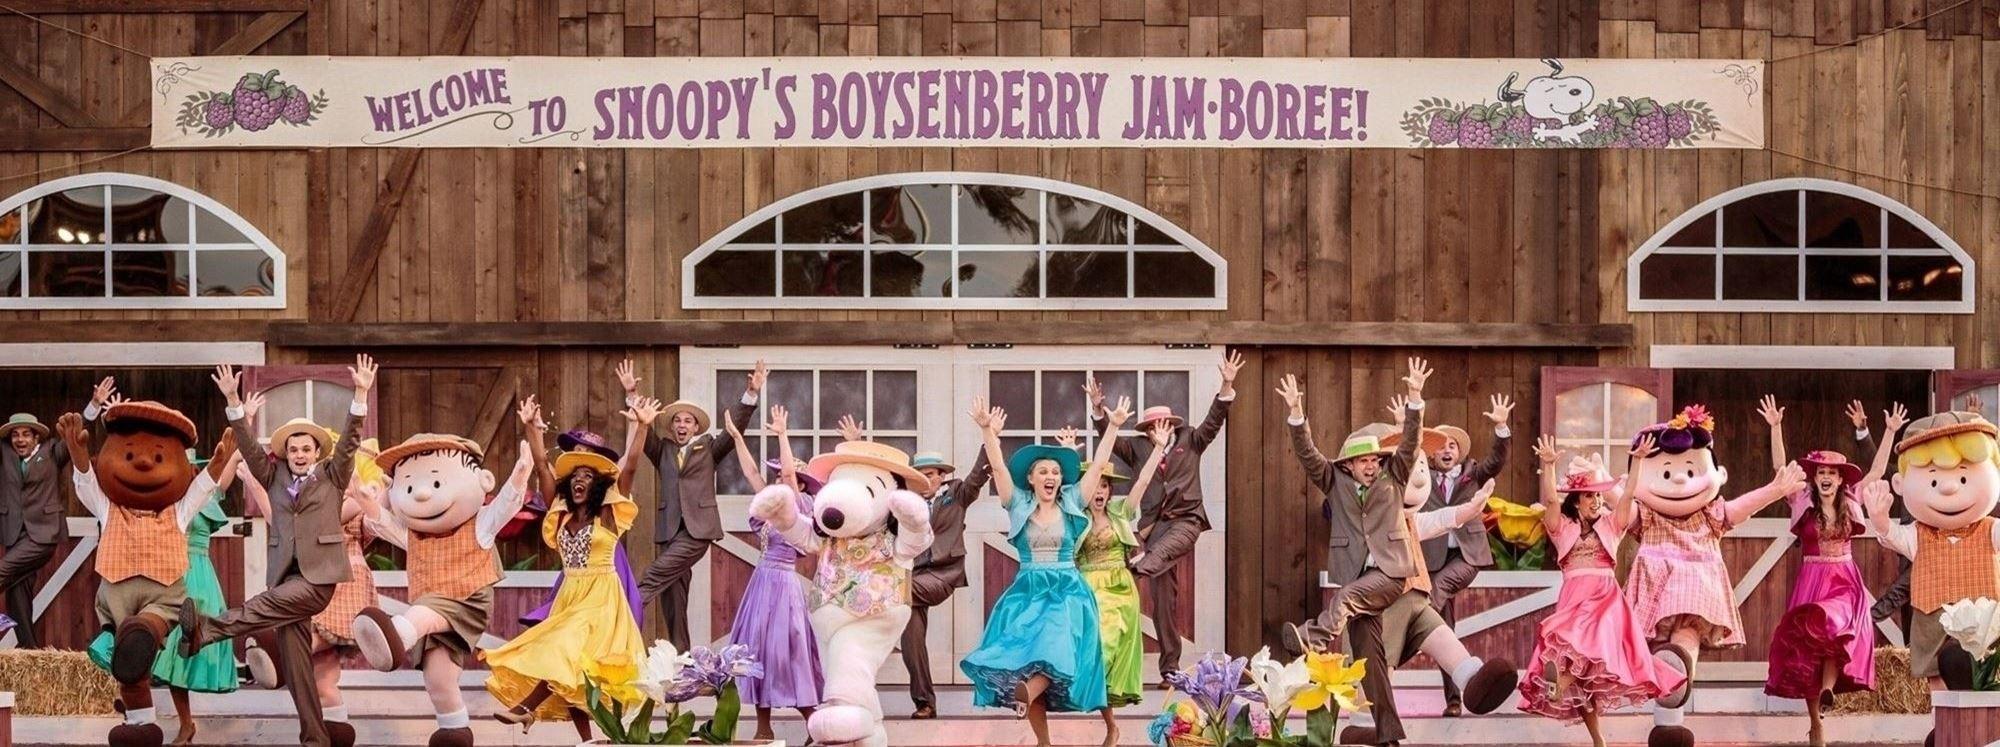 Boysenberry Festival performance at Knott's Berry Farm in Buena Park, CA